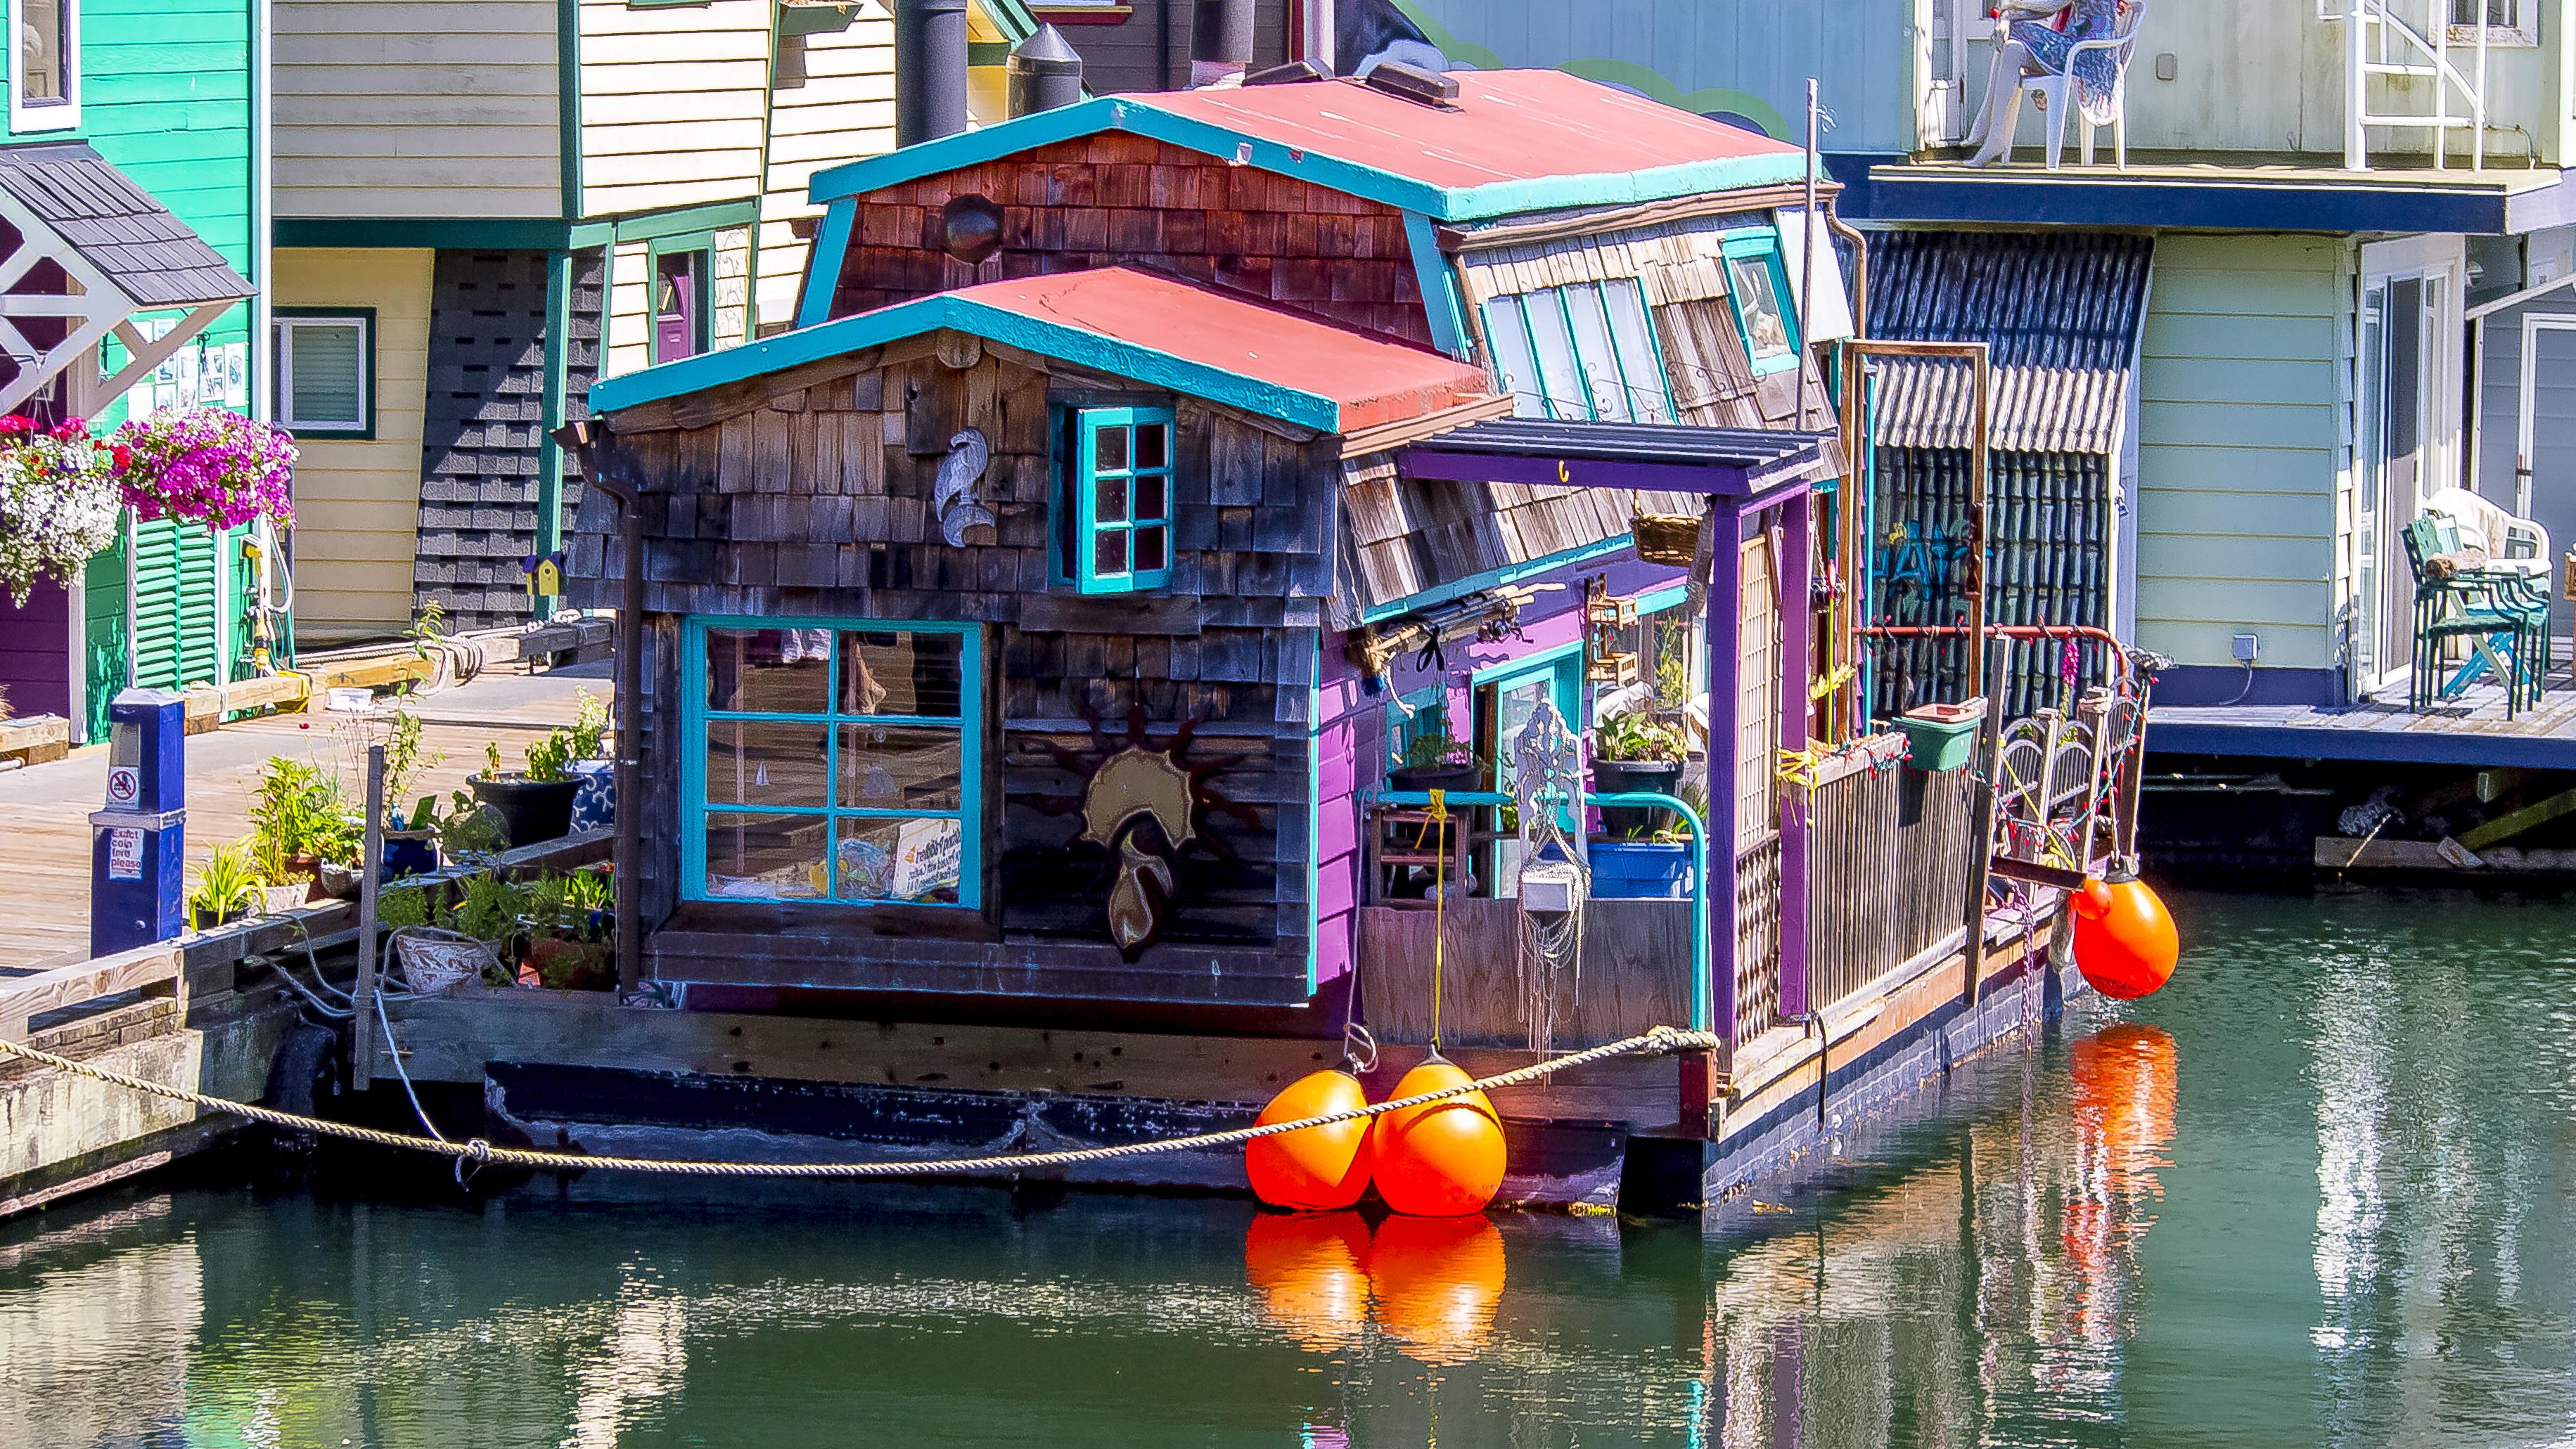 Kostenlose foto : Wasser, Boot, Haus, Seebrücke, Kanal, Ferien ...